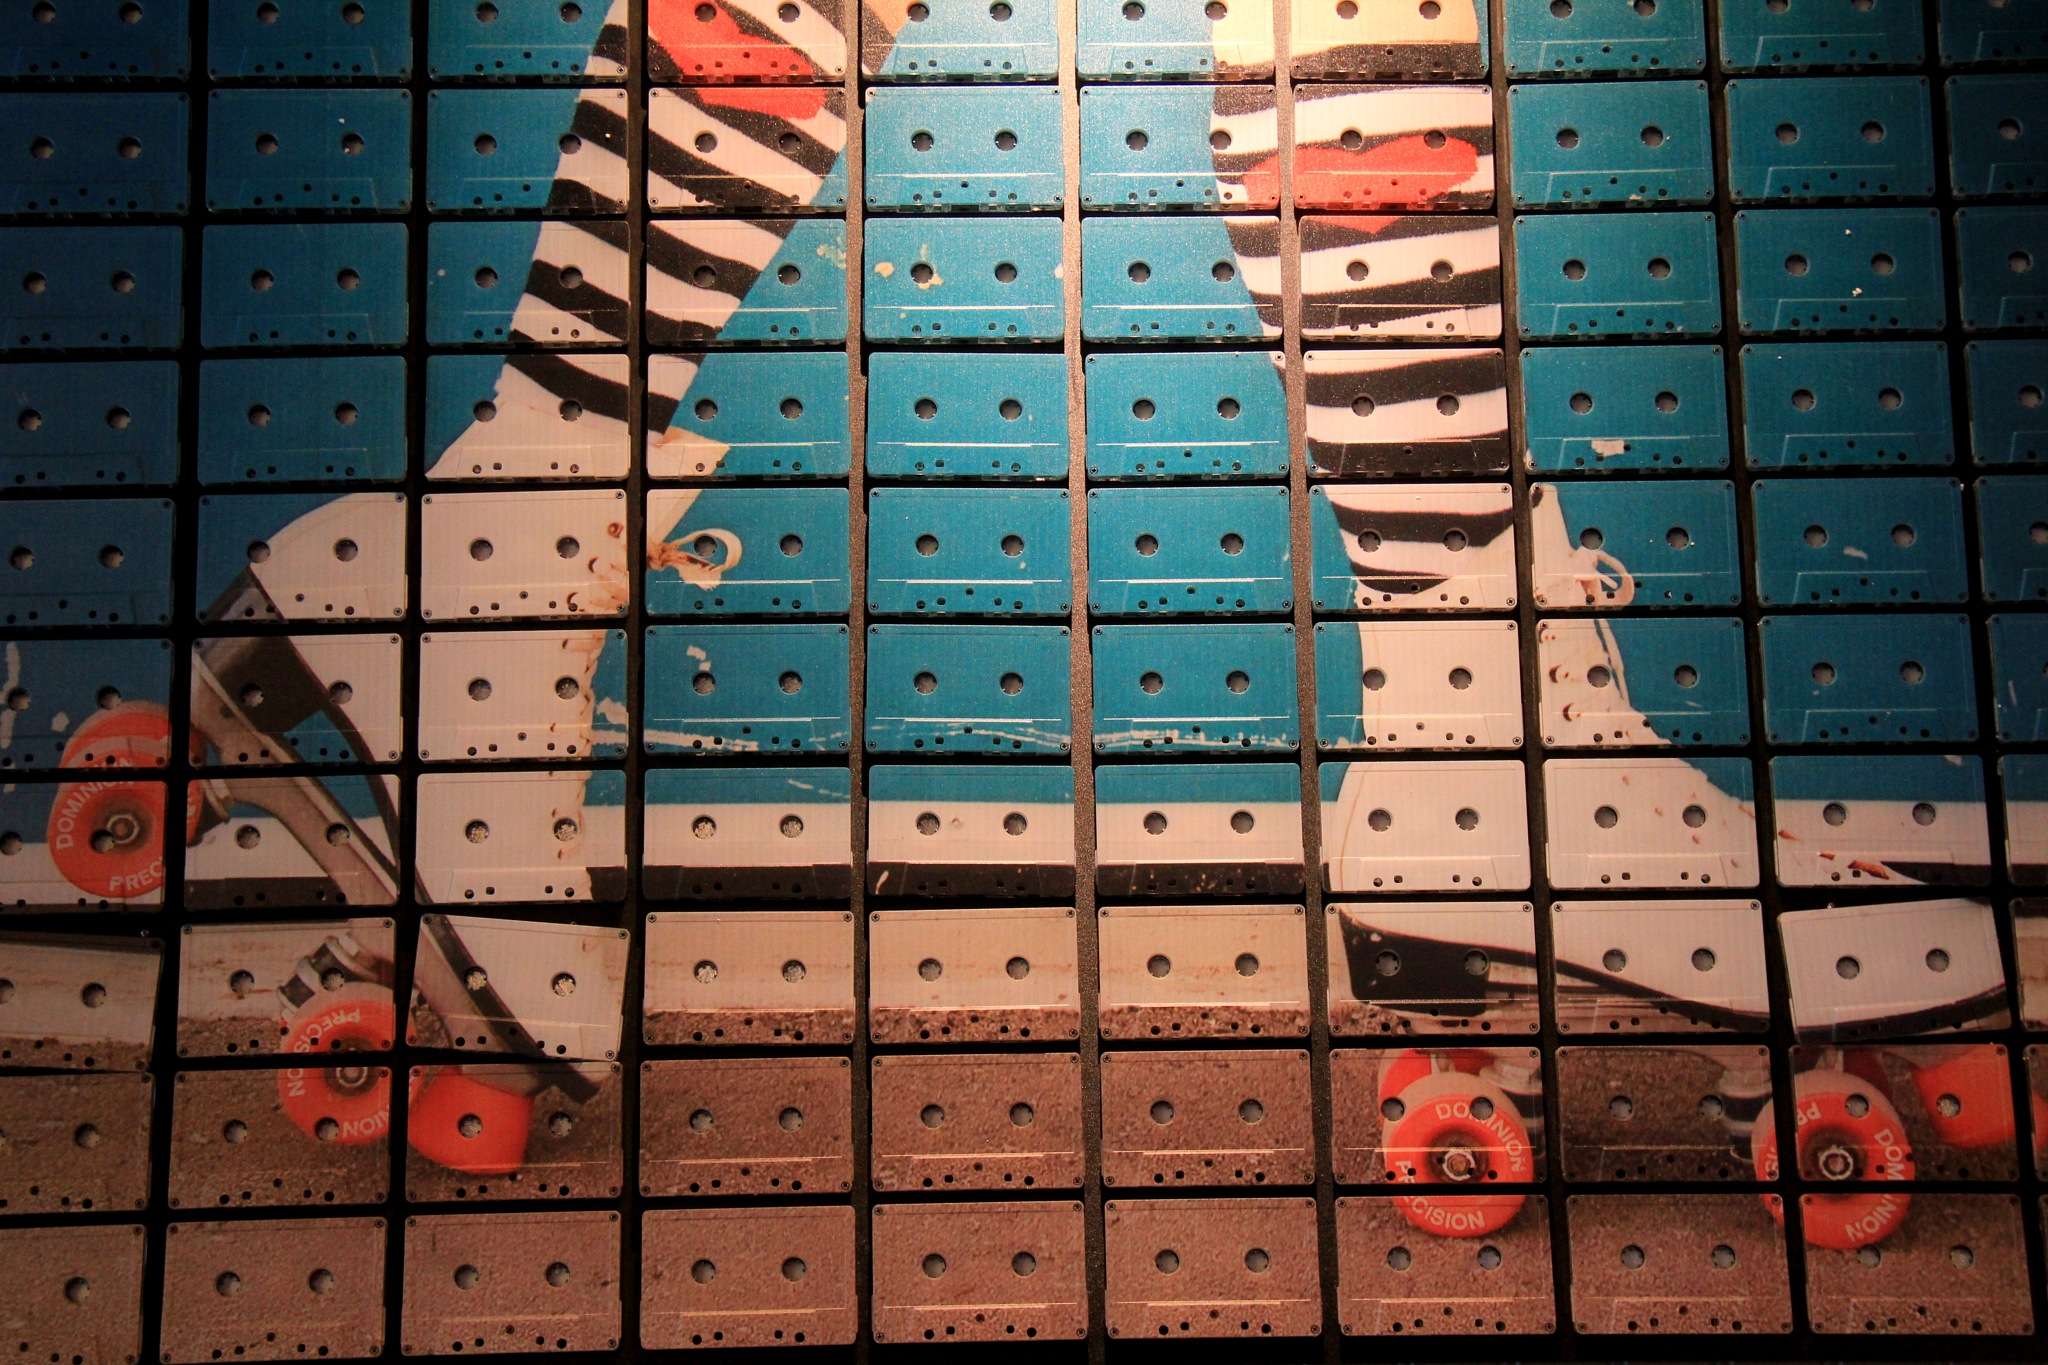 roller skate queen by theresaSt.john